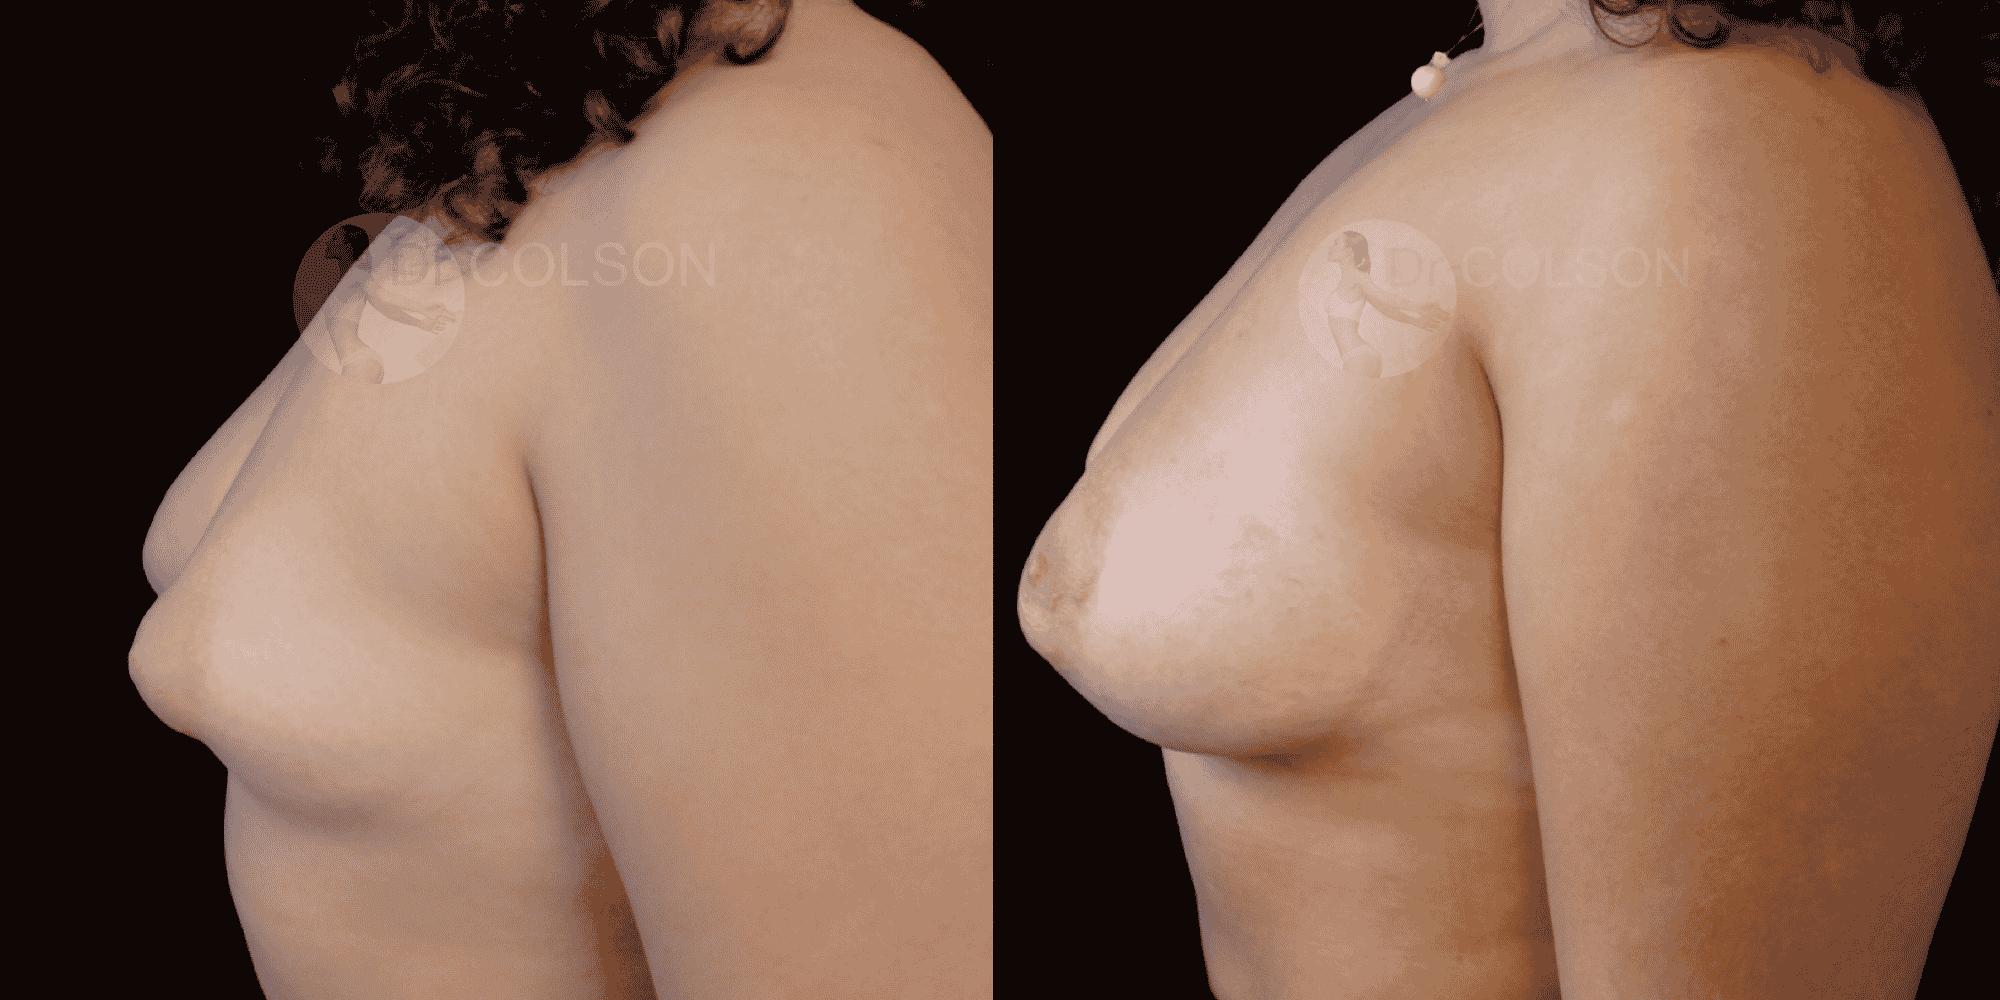 Dr Colson - Chirurgie sein - Asymetrie Profil